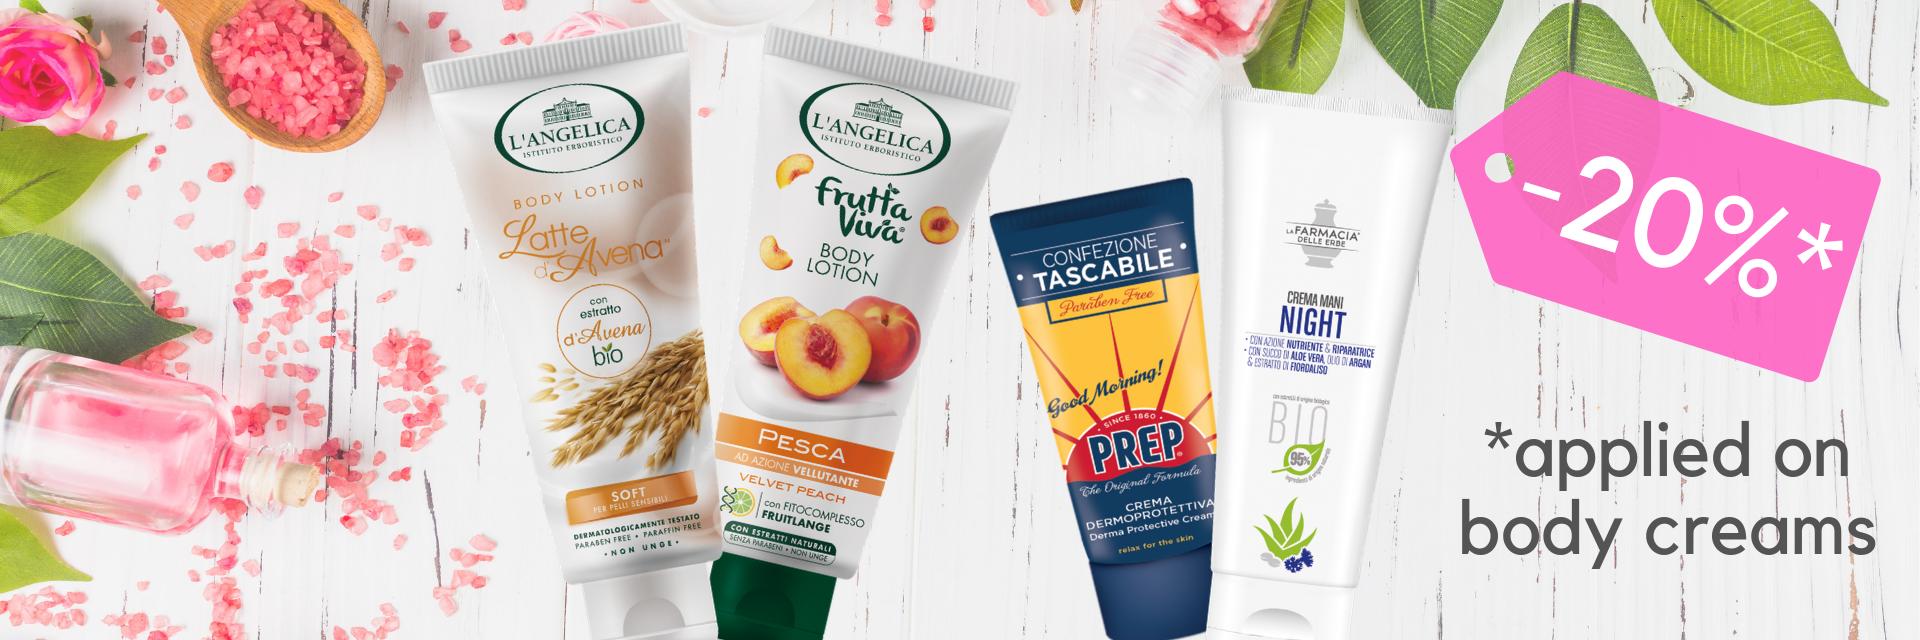 promo body creams